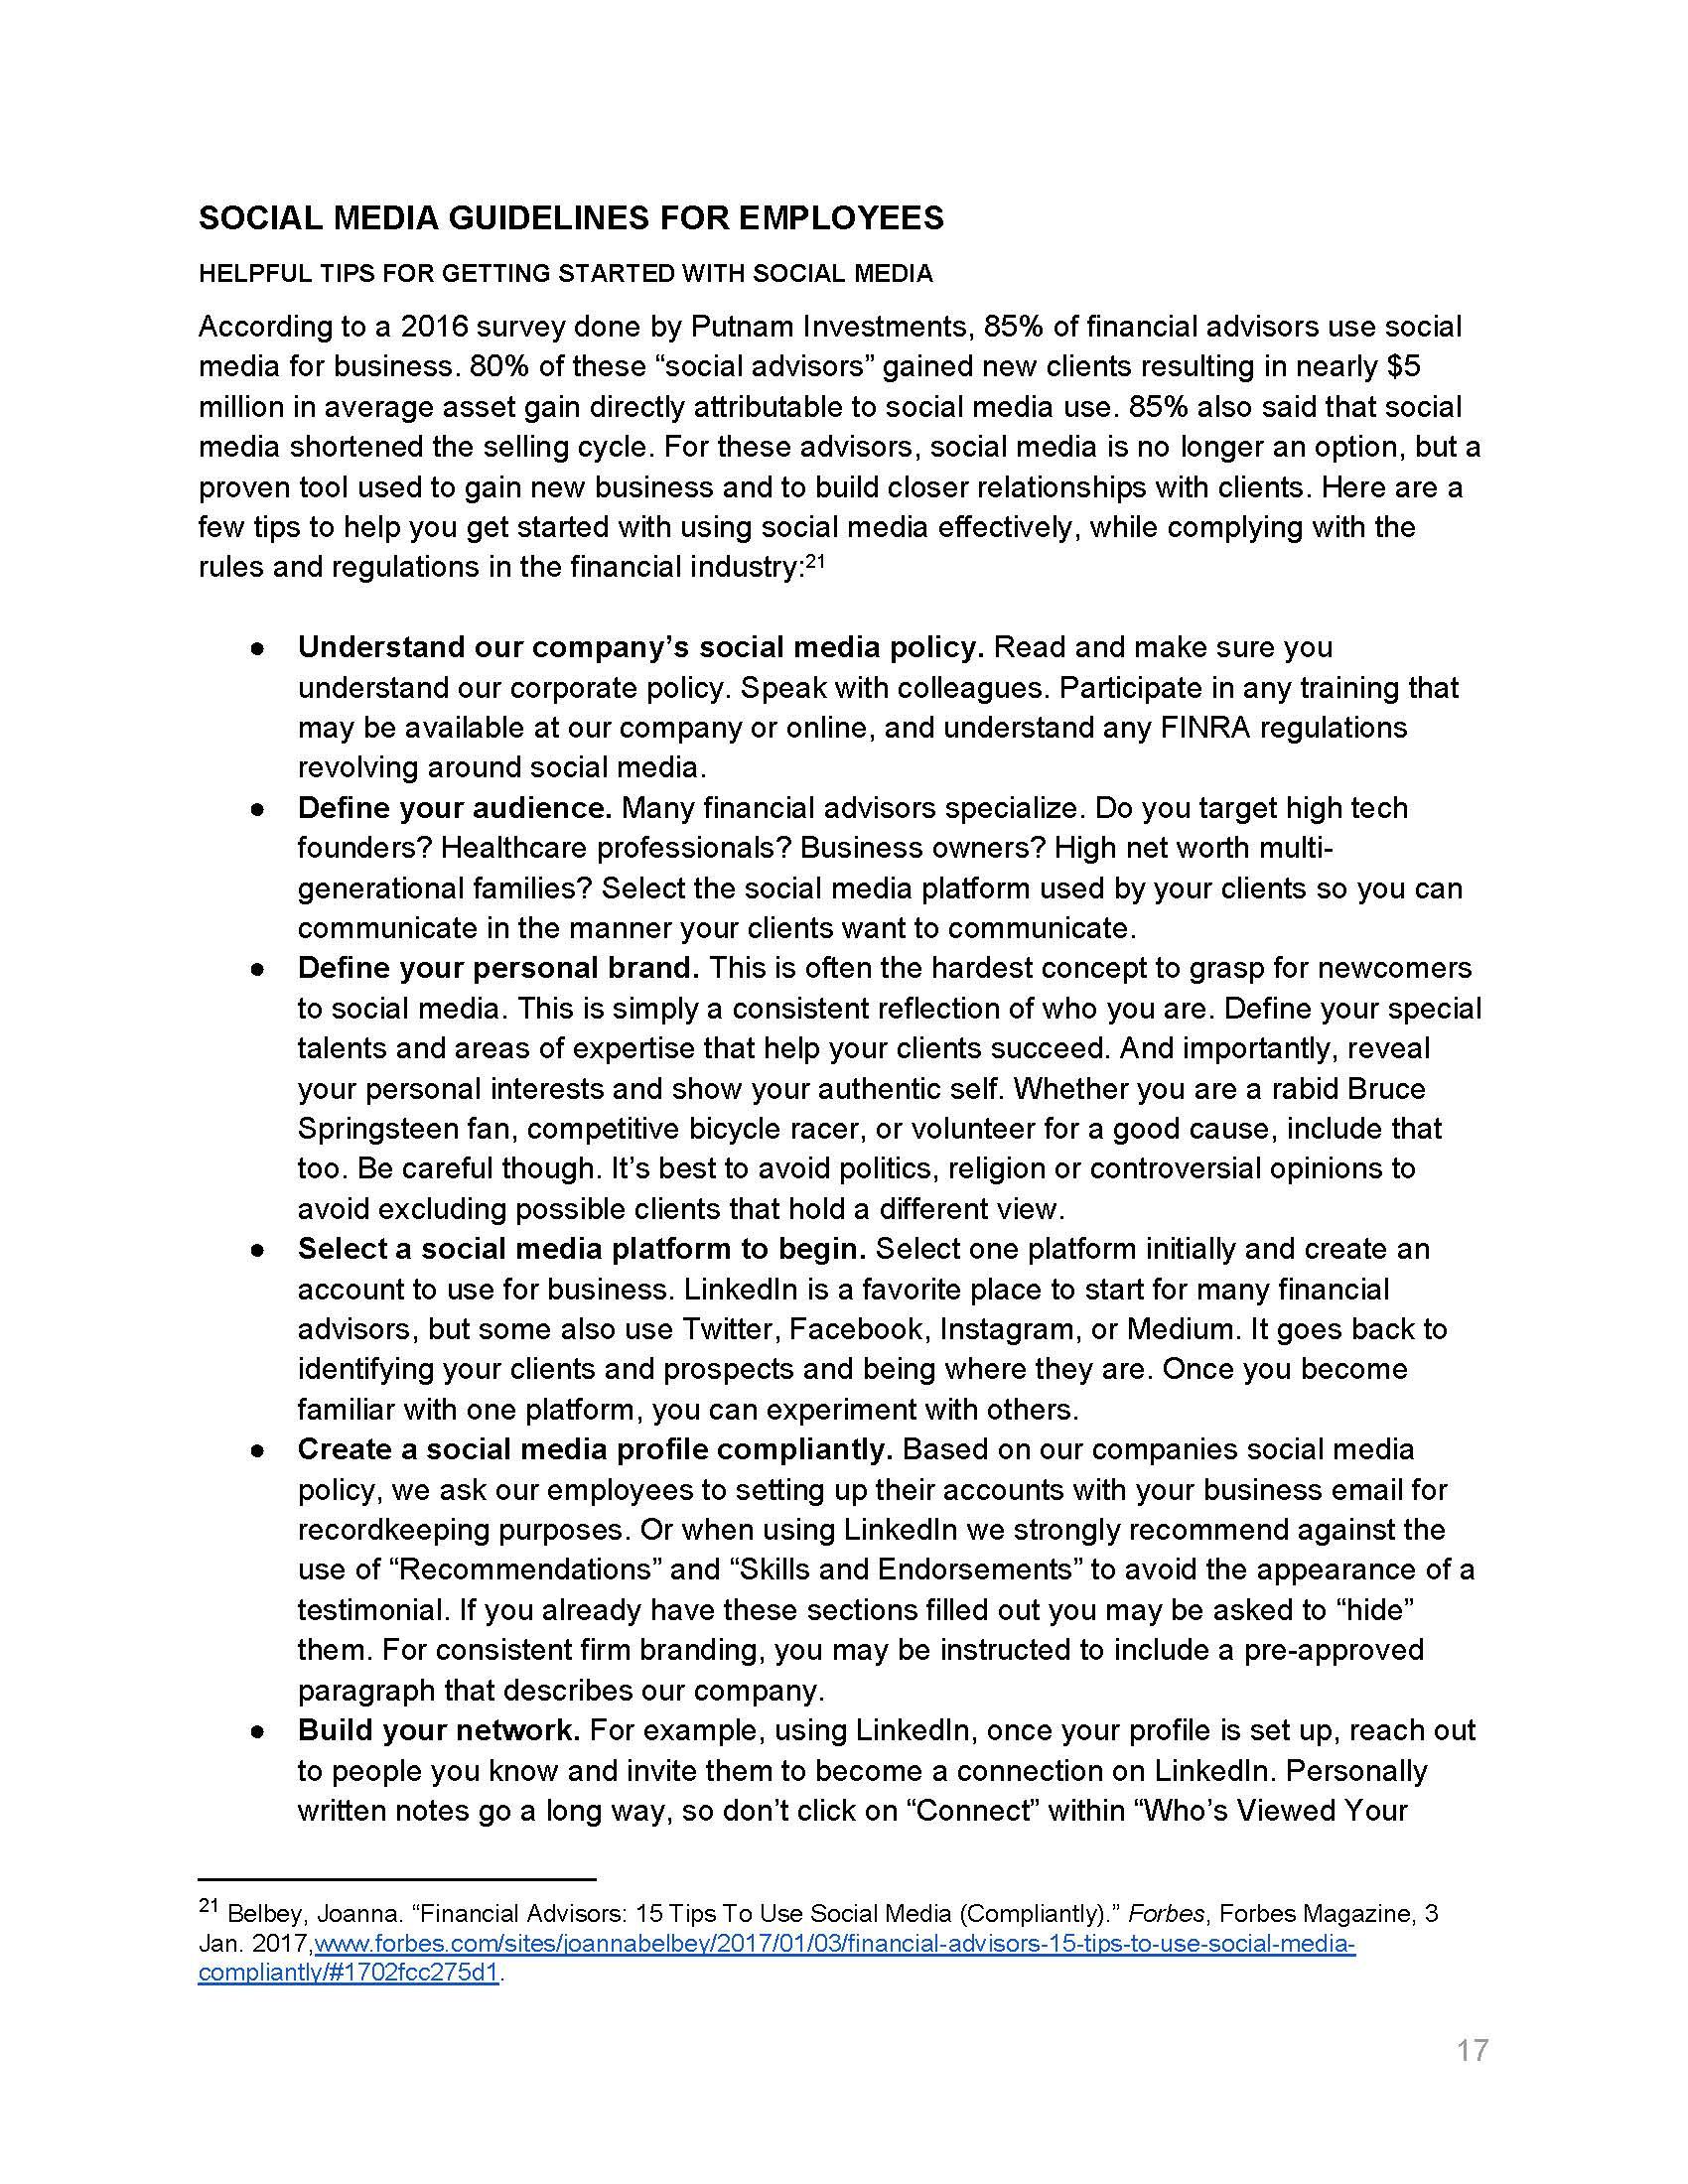 Amity Financial - Social Media White Paper_Page_18.jpg